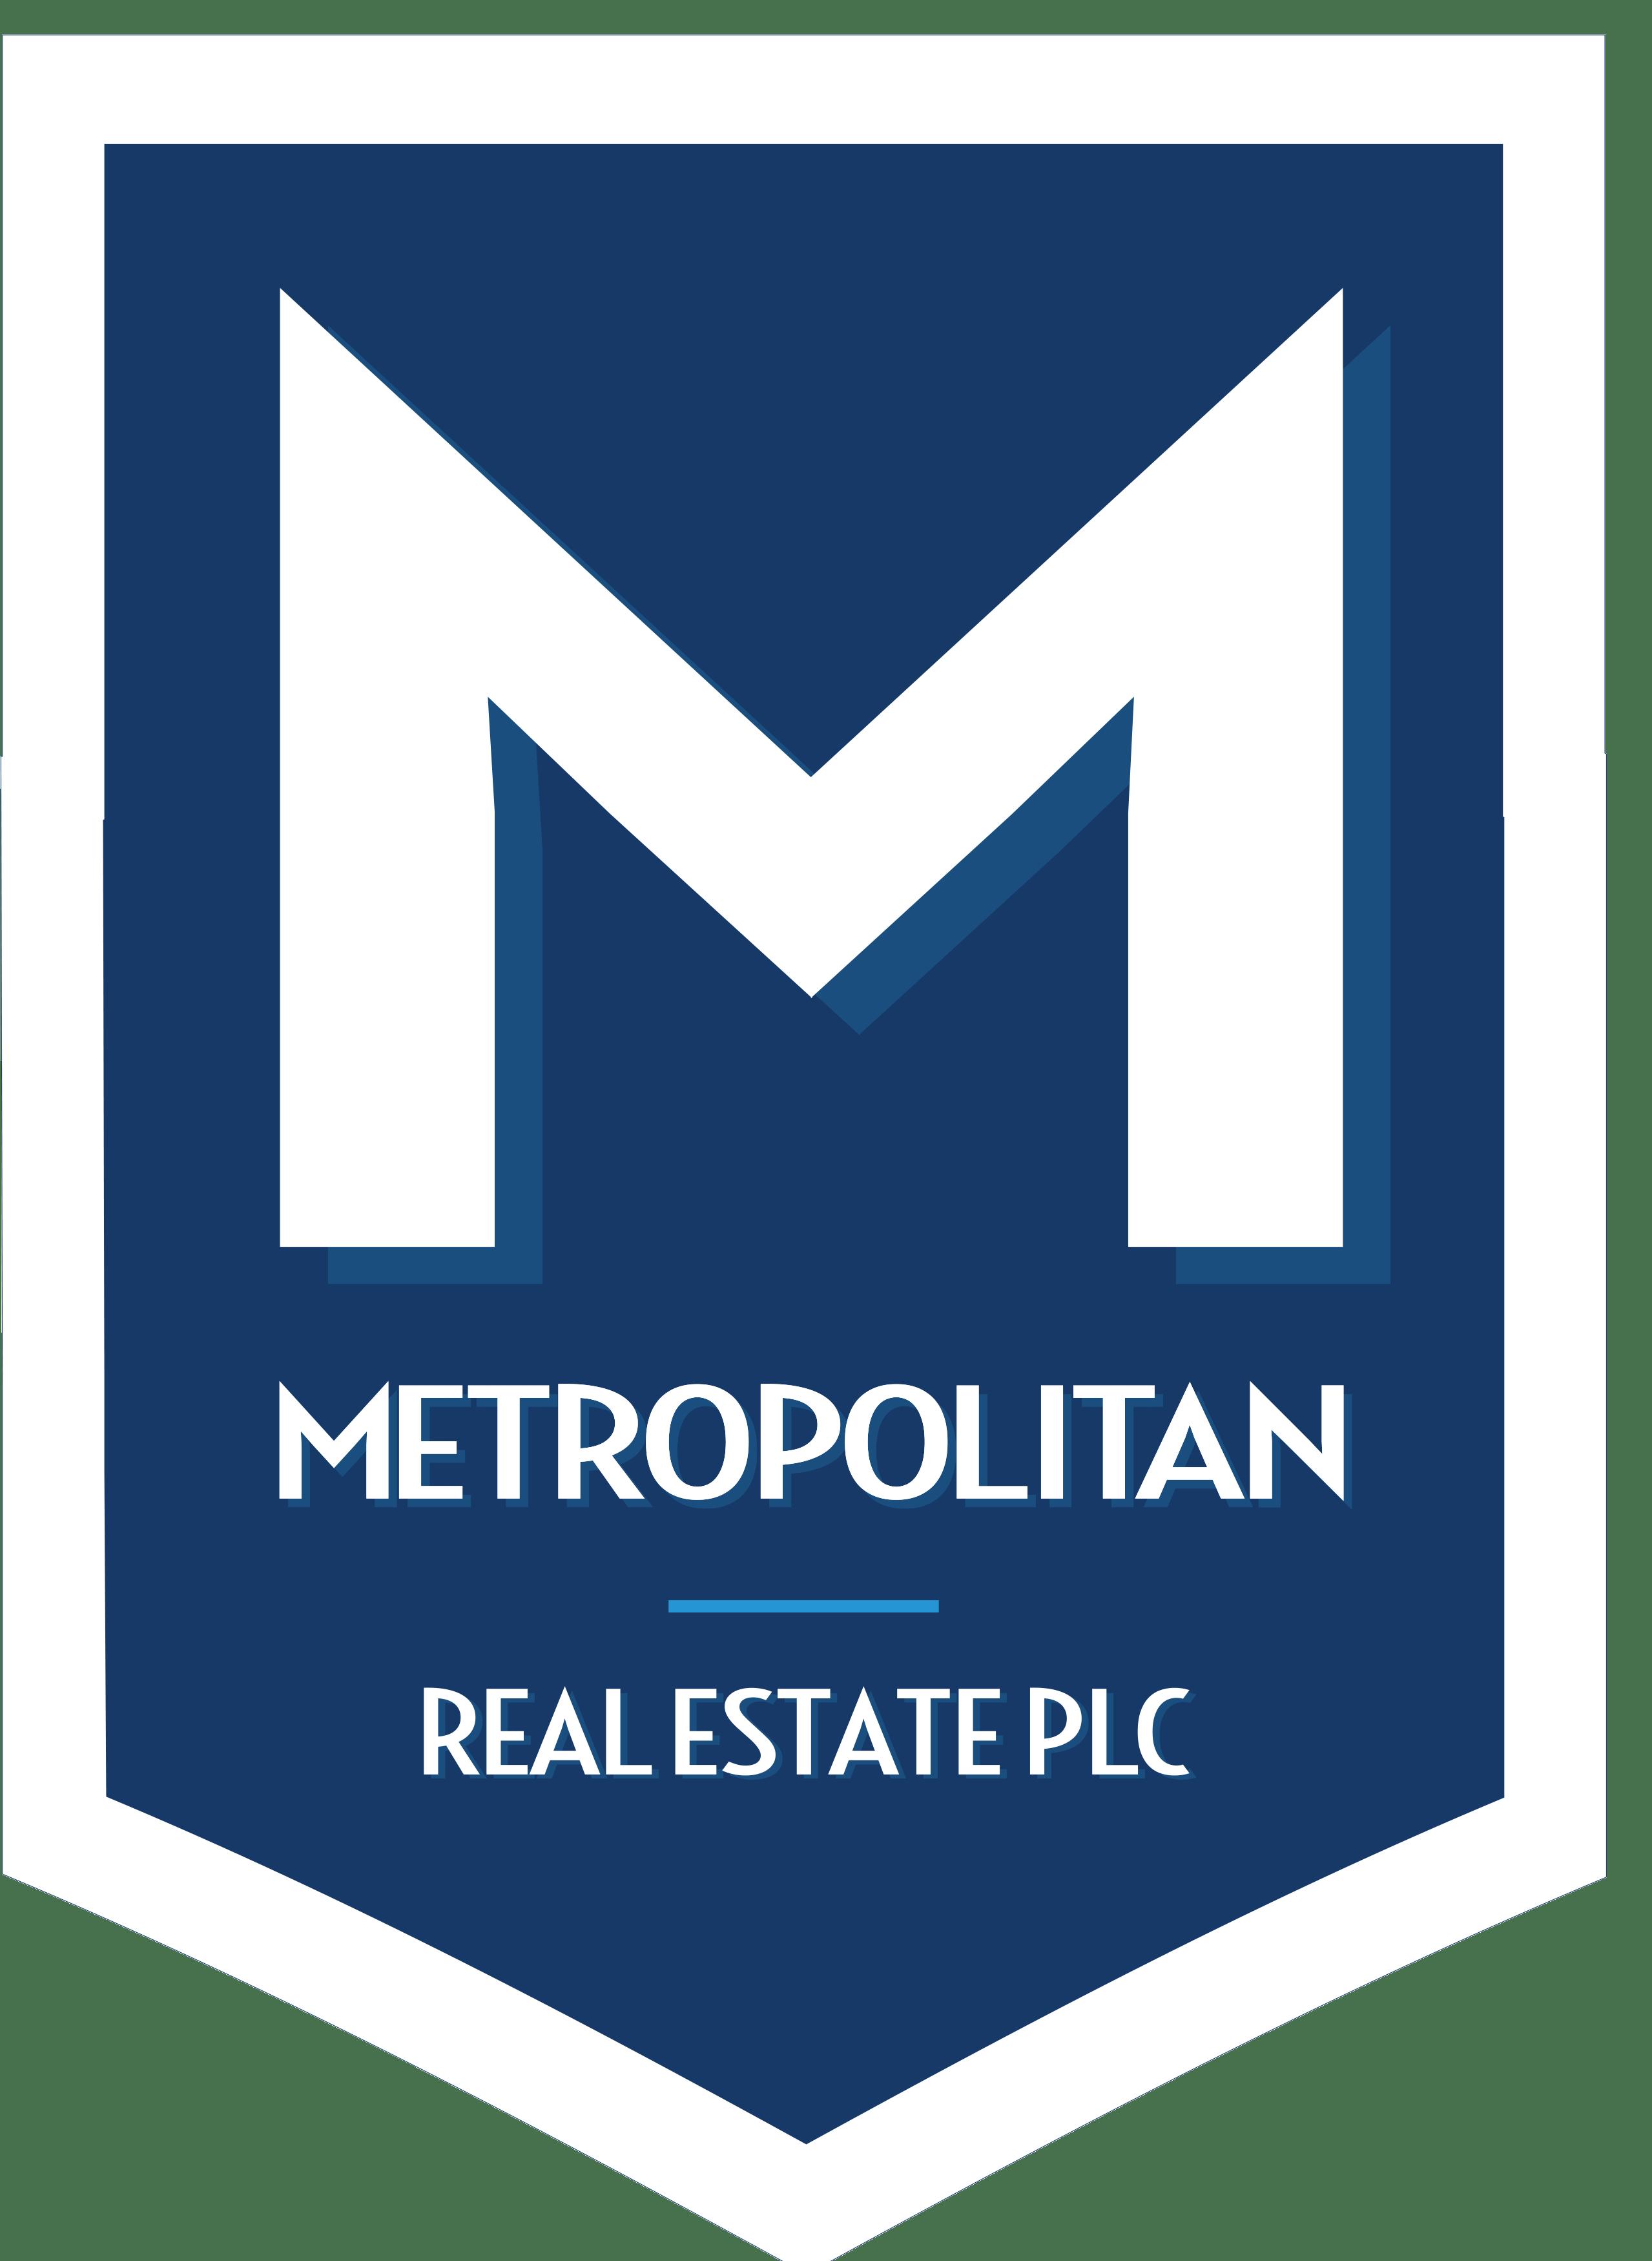 metpopolitan-logolar-6